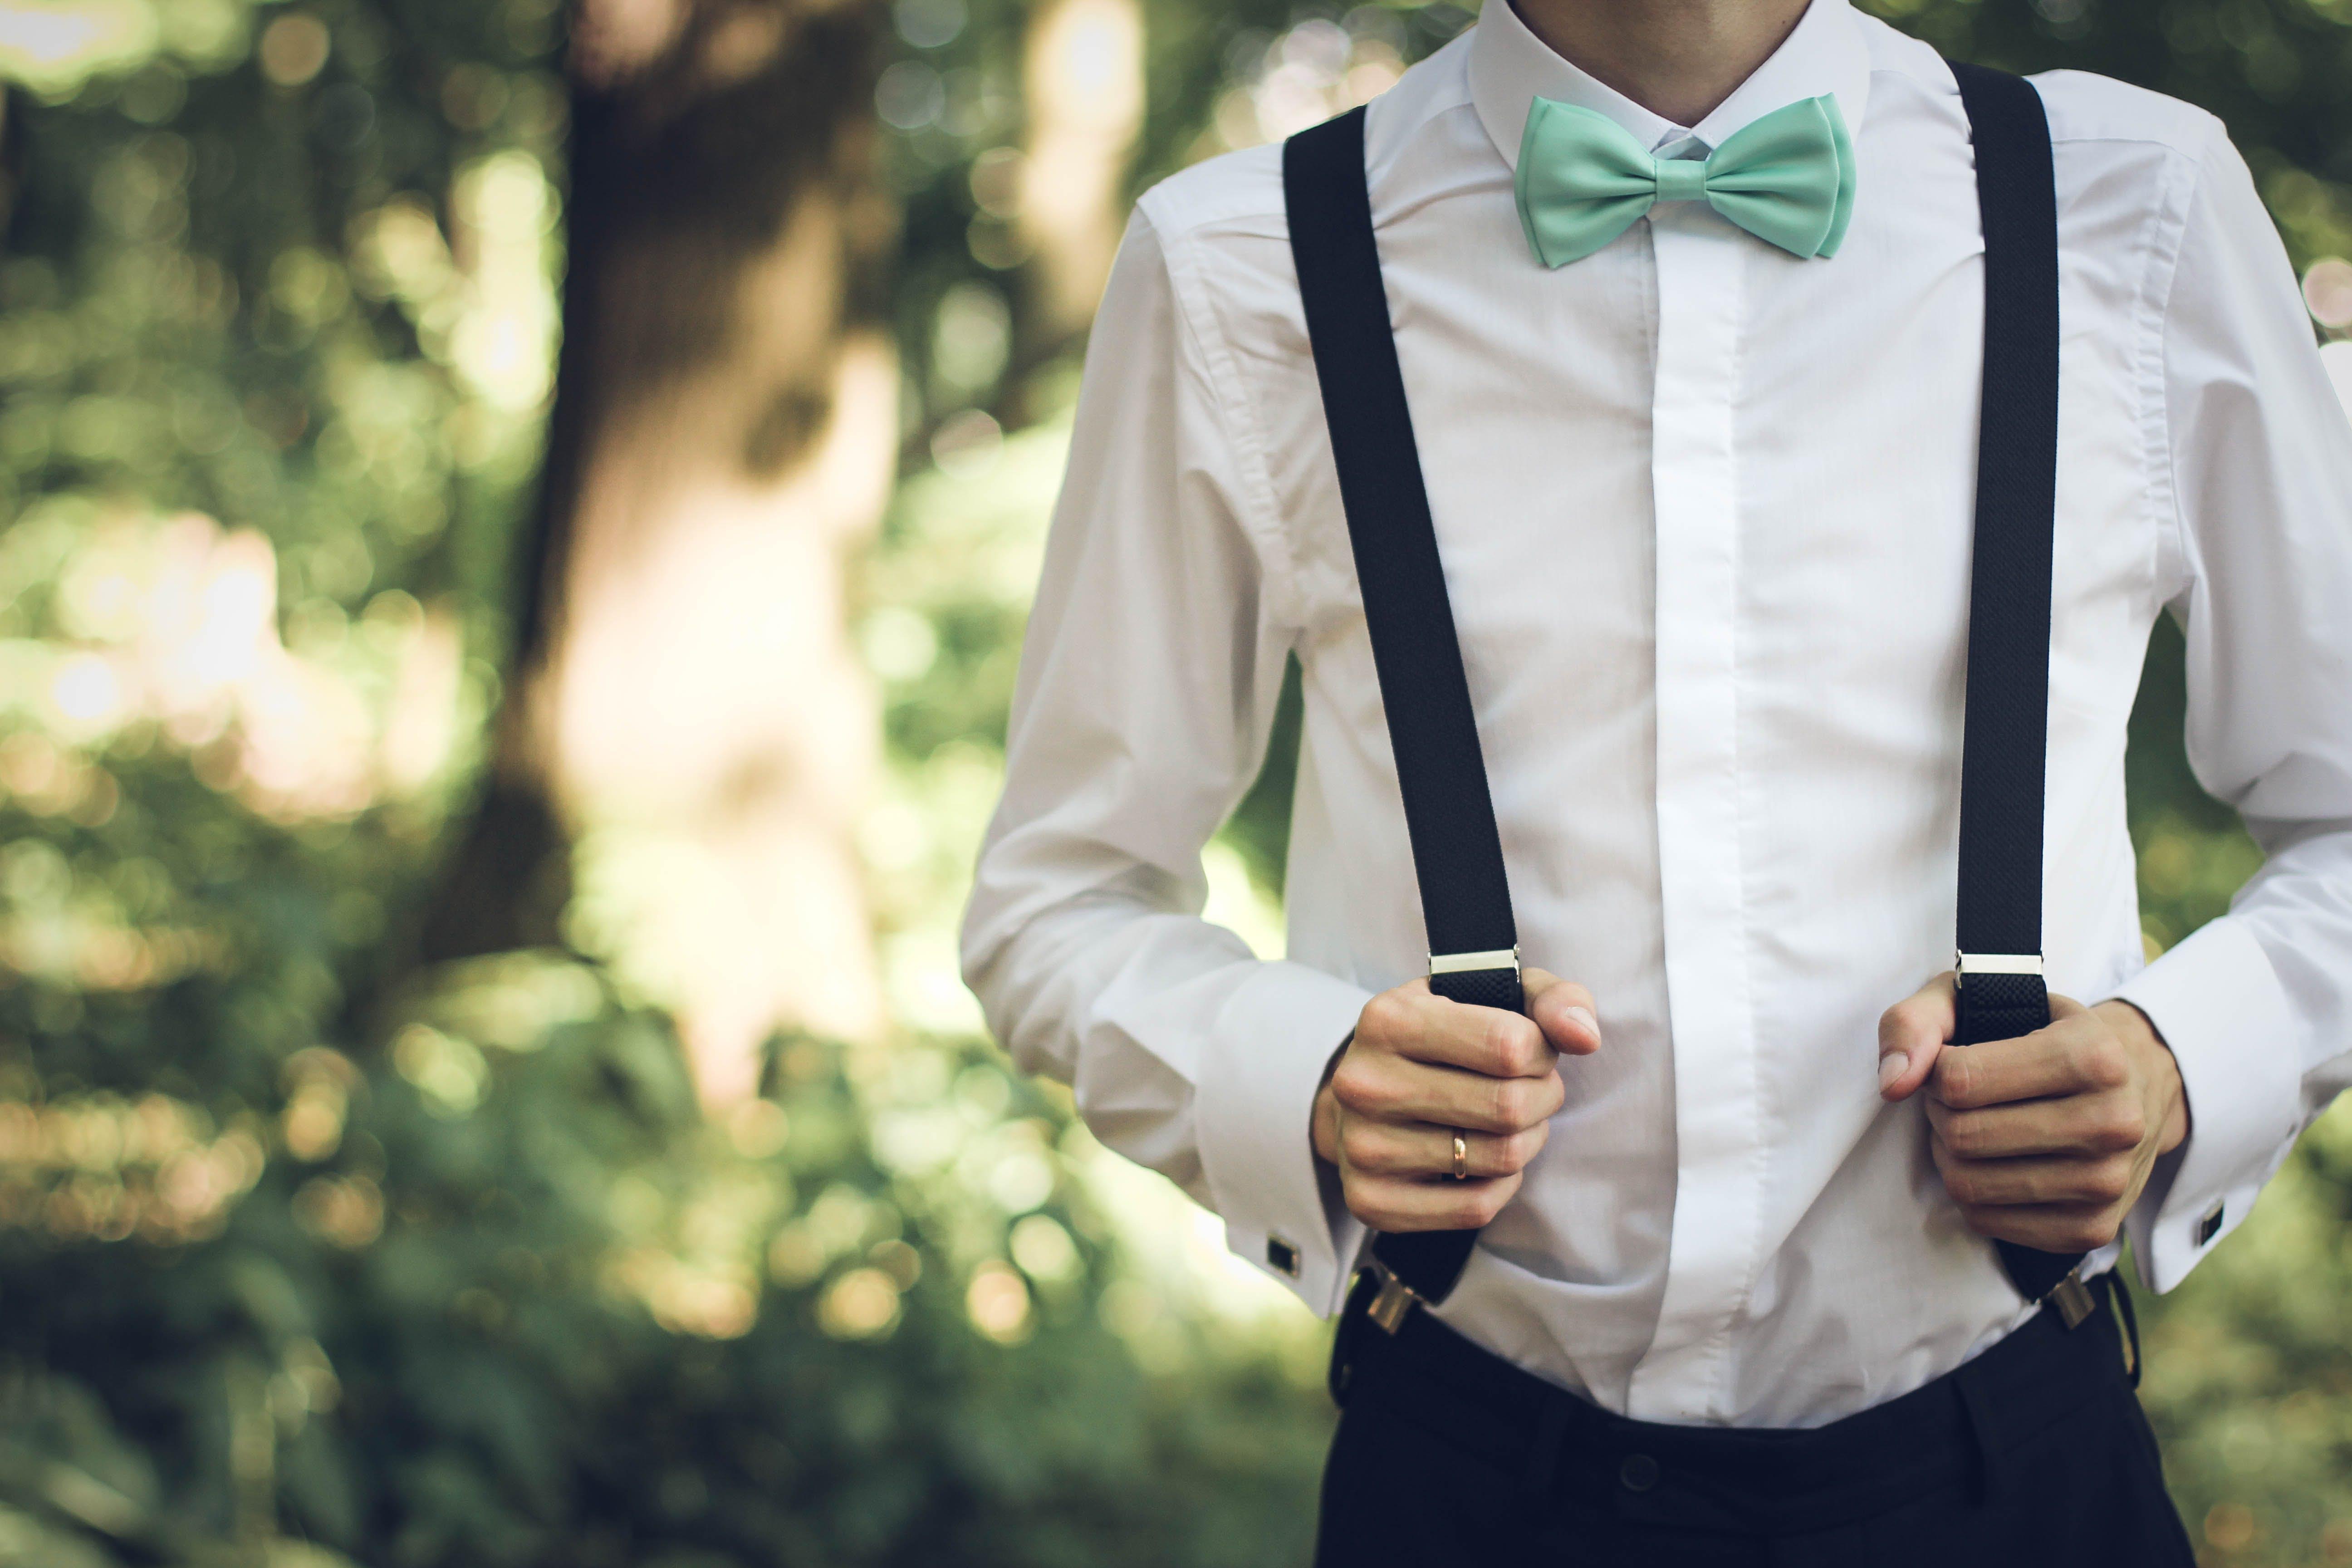 adult, blur, bow tie